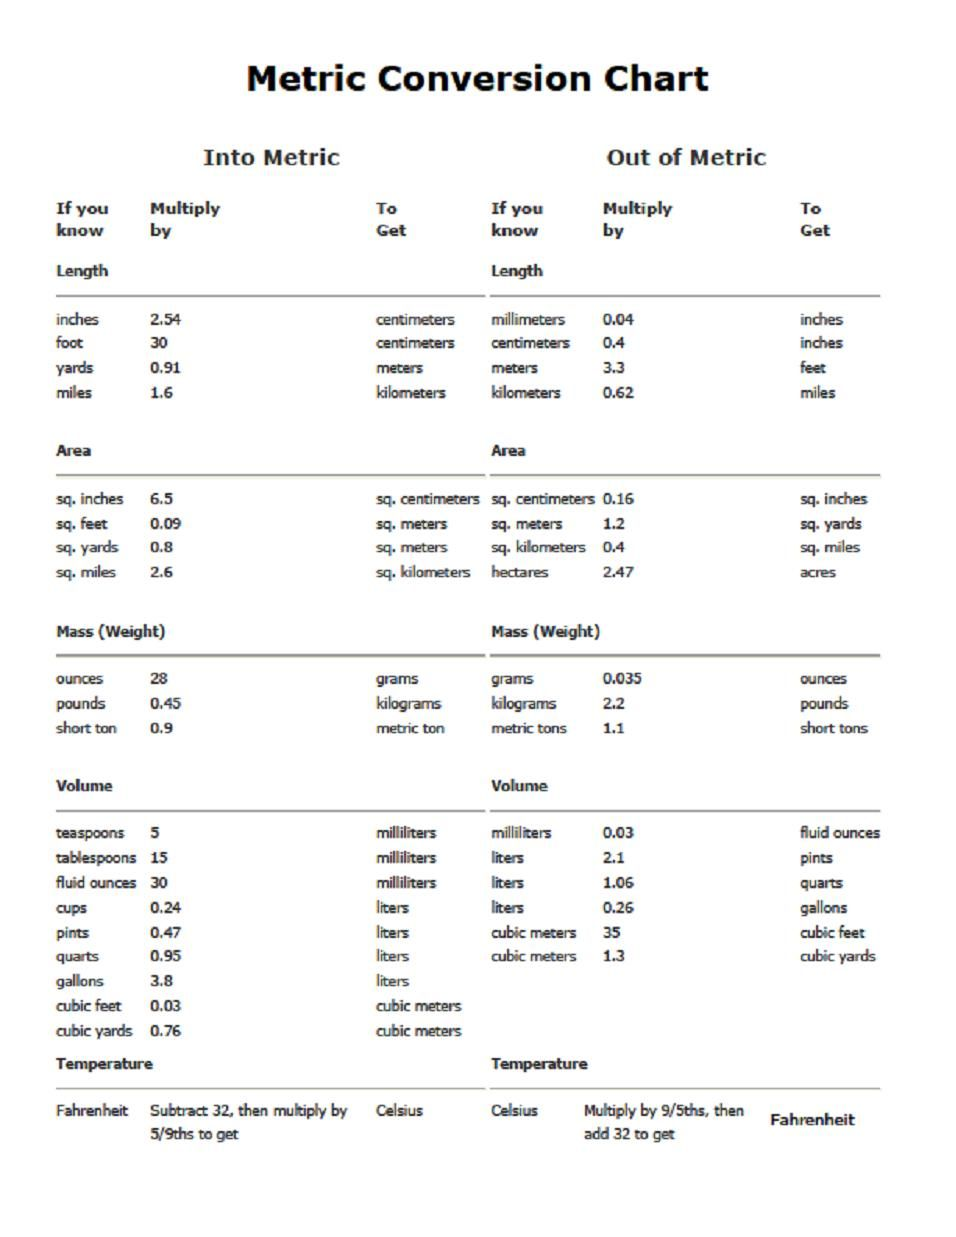 Metric conversion table chart pdf printable also rh pinterest